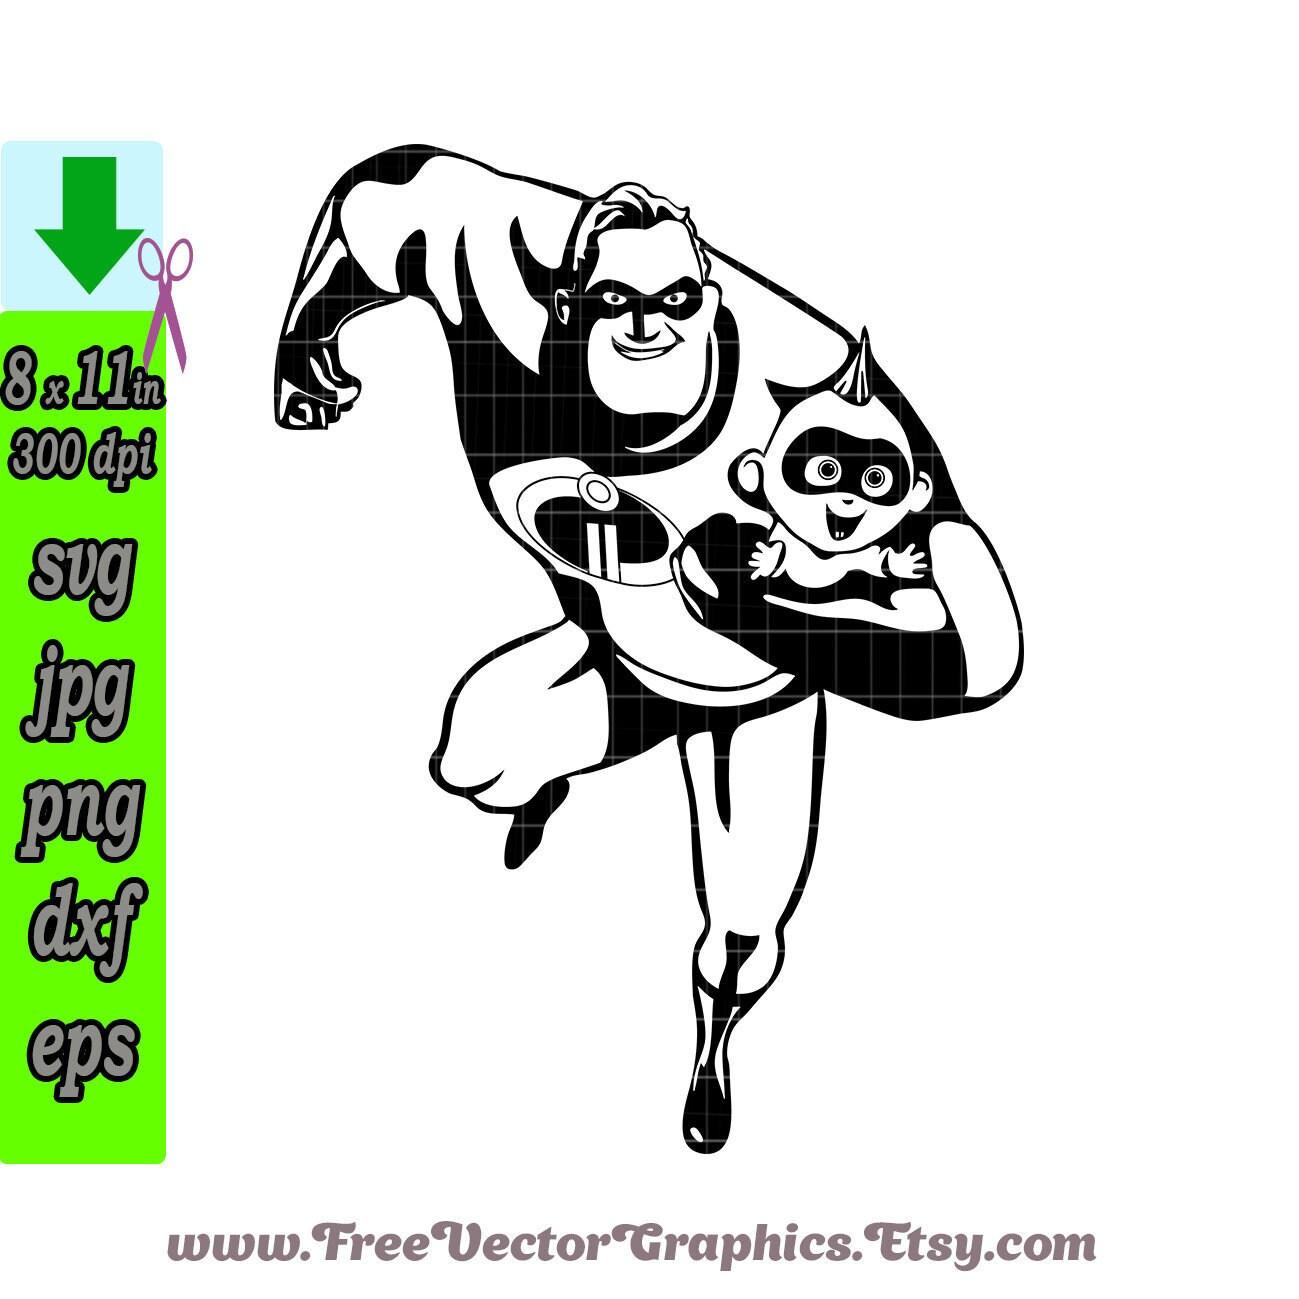 Baby & Mr  Incredible svg, Superhero Clipart, Superhero svg, Disney svg  cricut, father incredible, digital clipart, The Incredibles 2 vector